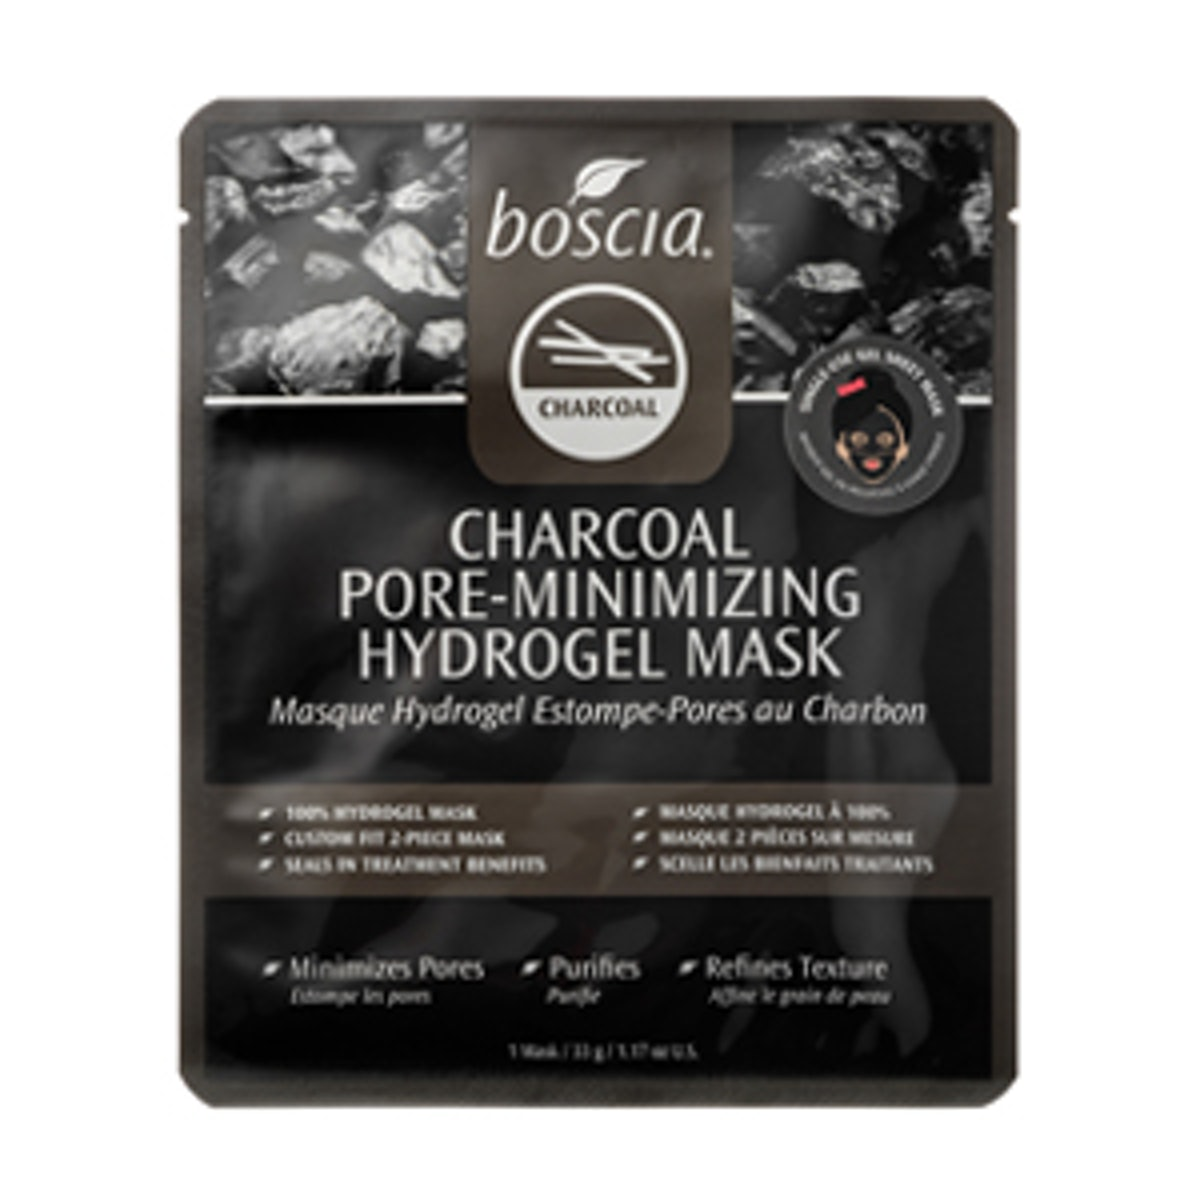 Charcoal Pore-Minimizing Hydrogel Mask